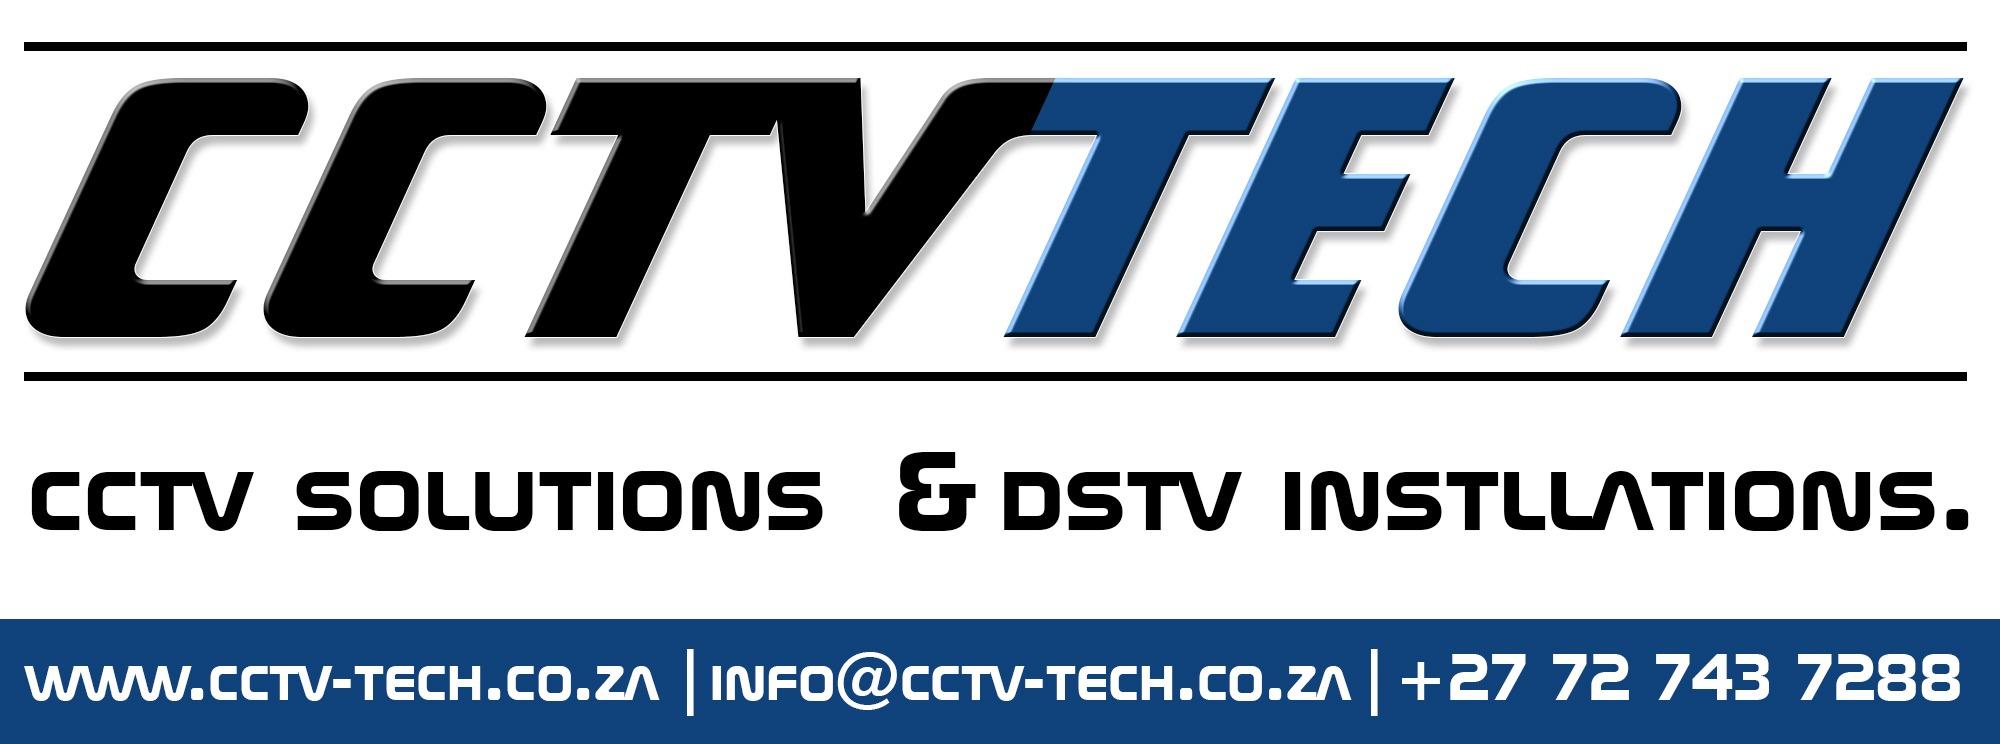 CCTV-TECH